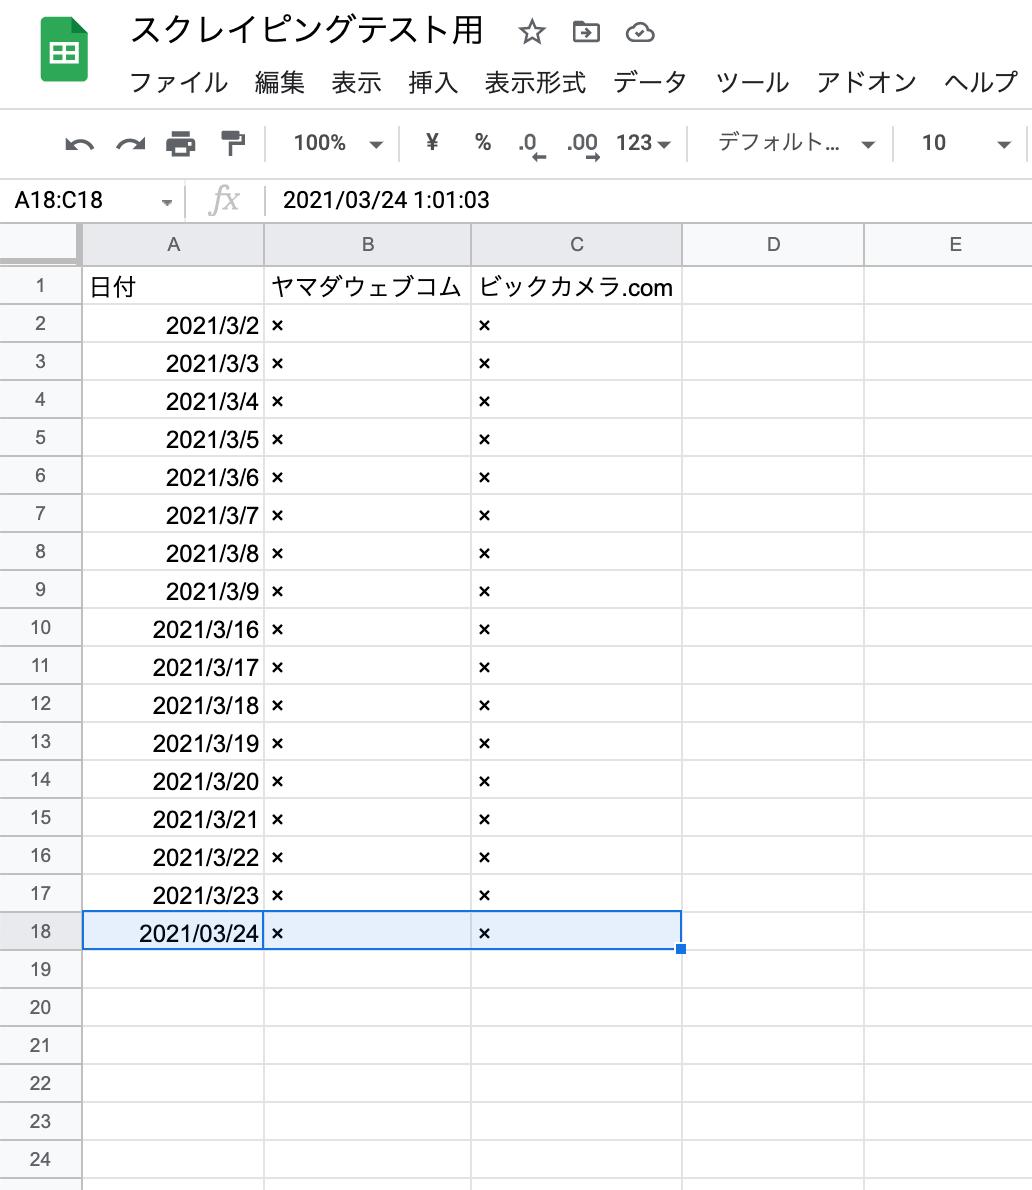 f:id:J-back:20210324010125p:plain:w600